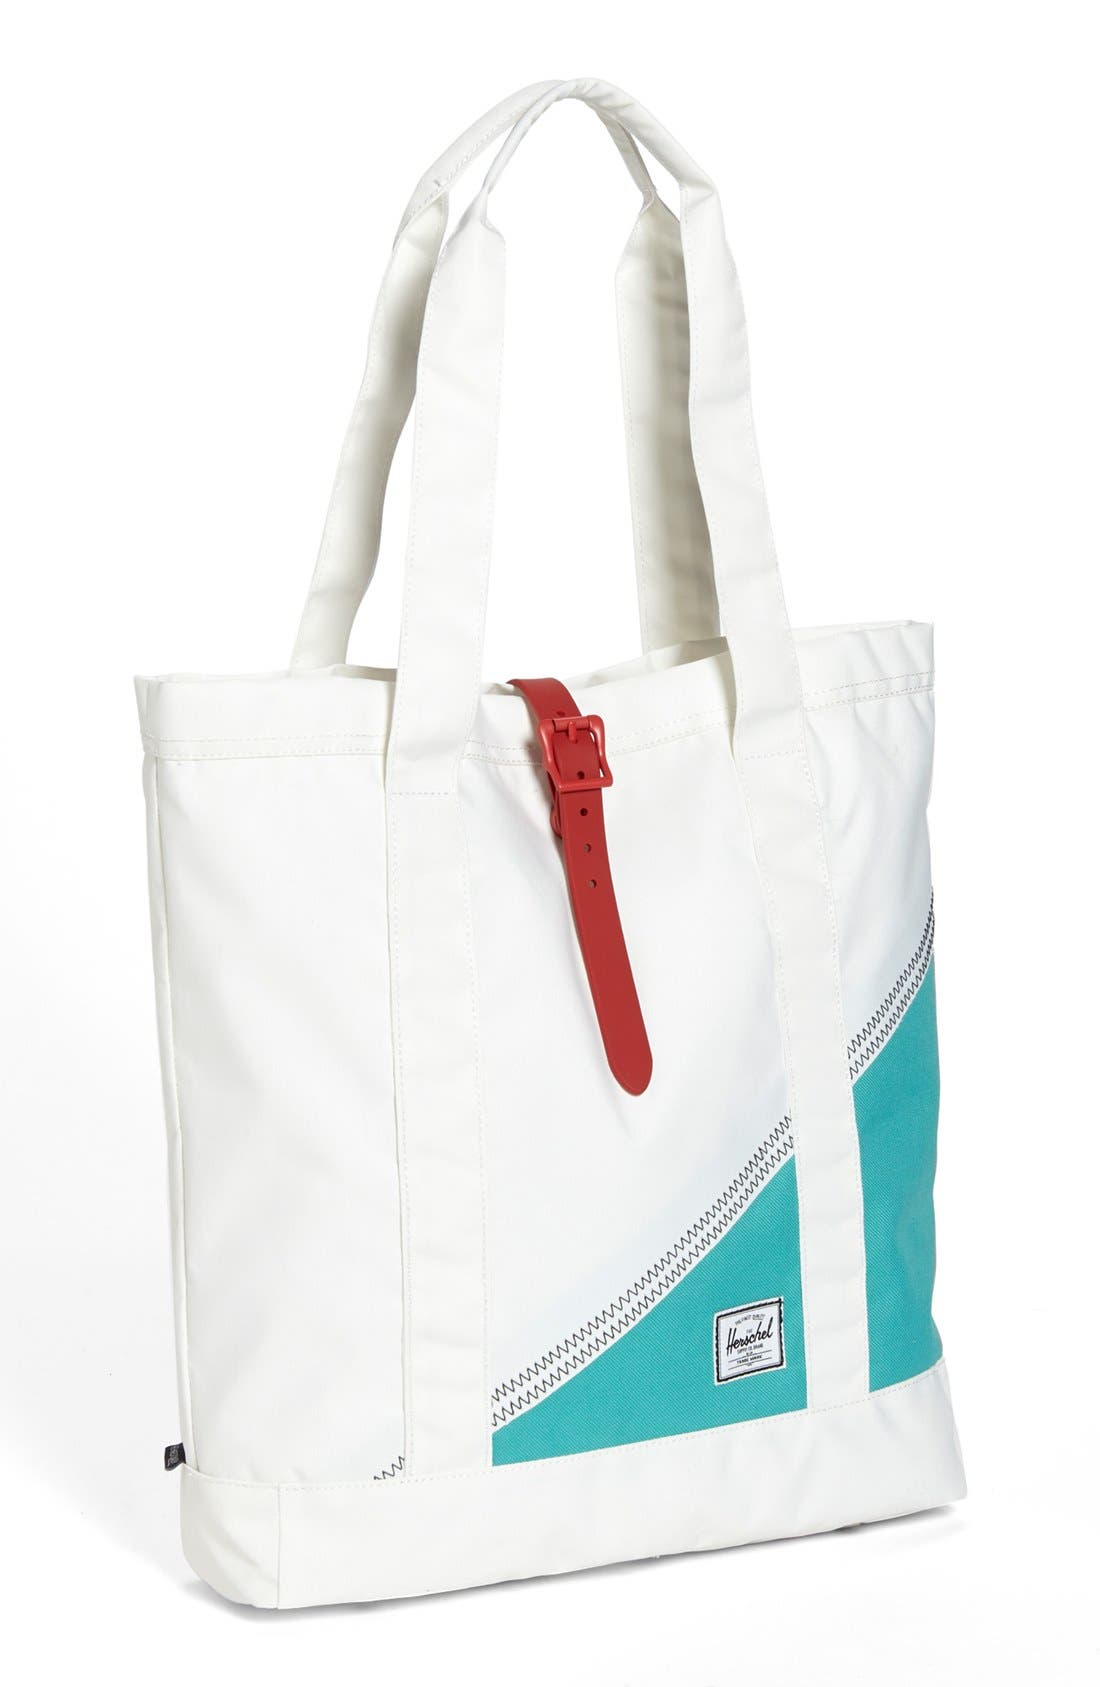 Main Image - Herschel Supply Co. 'Market - Studio Collection' Tote Bag